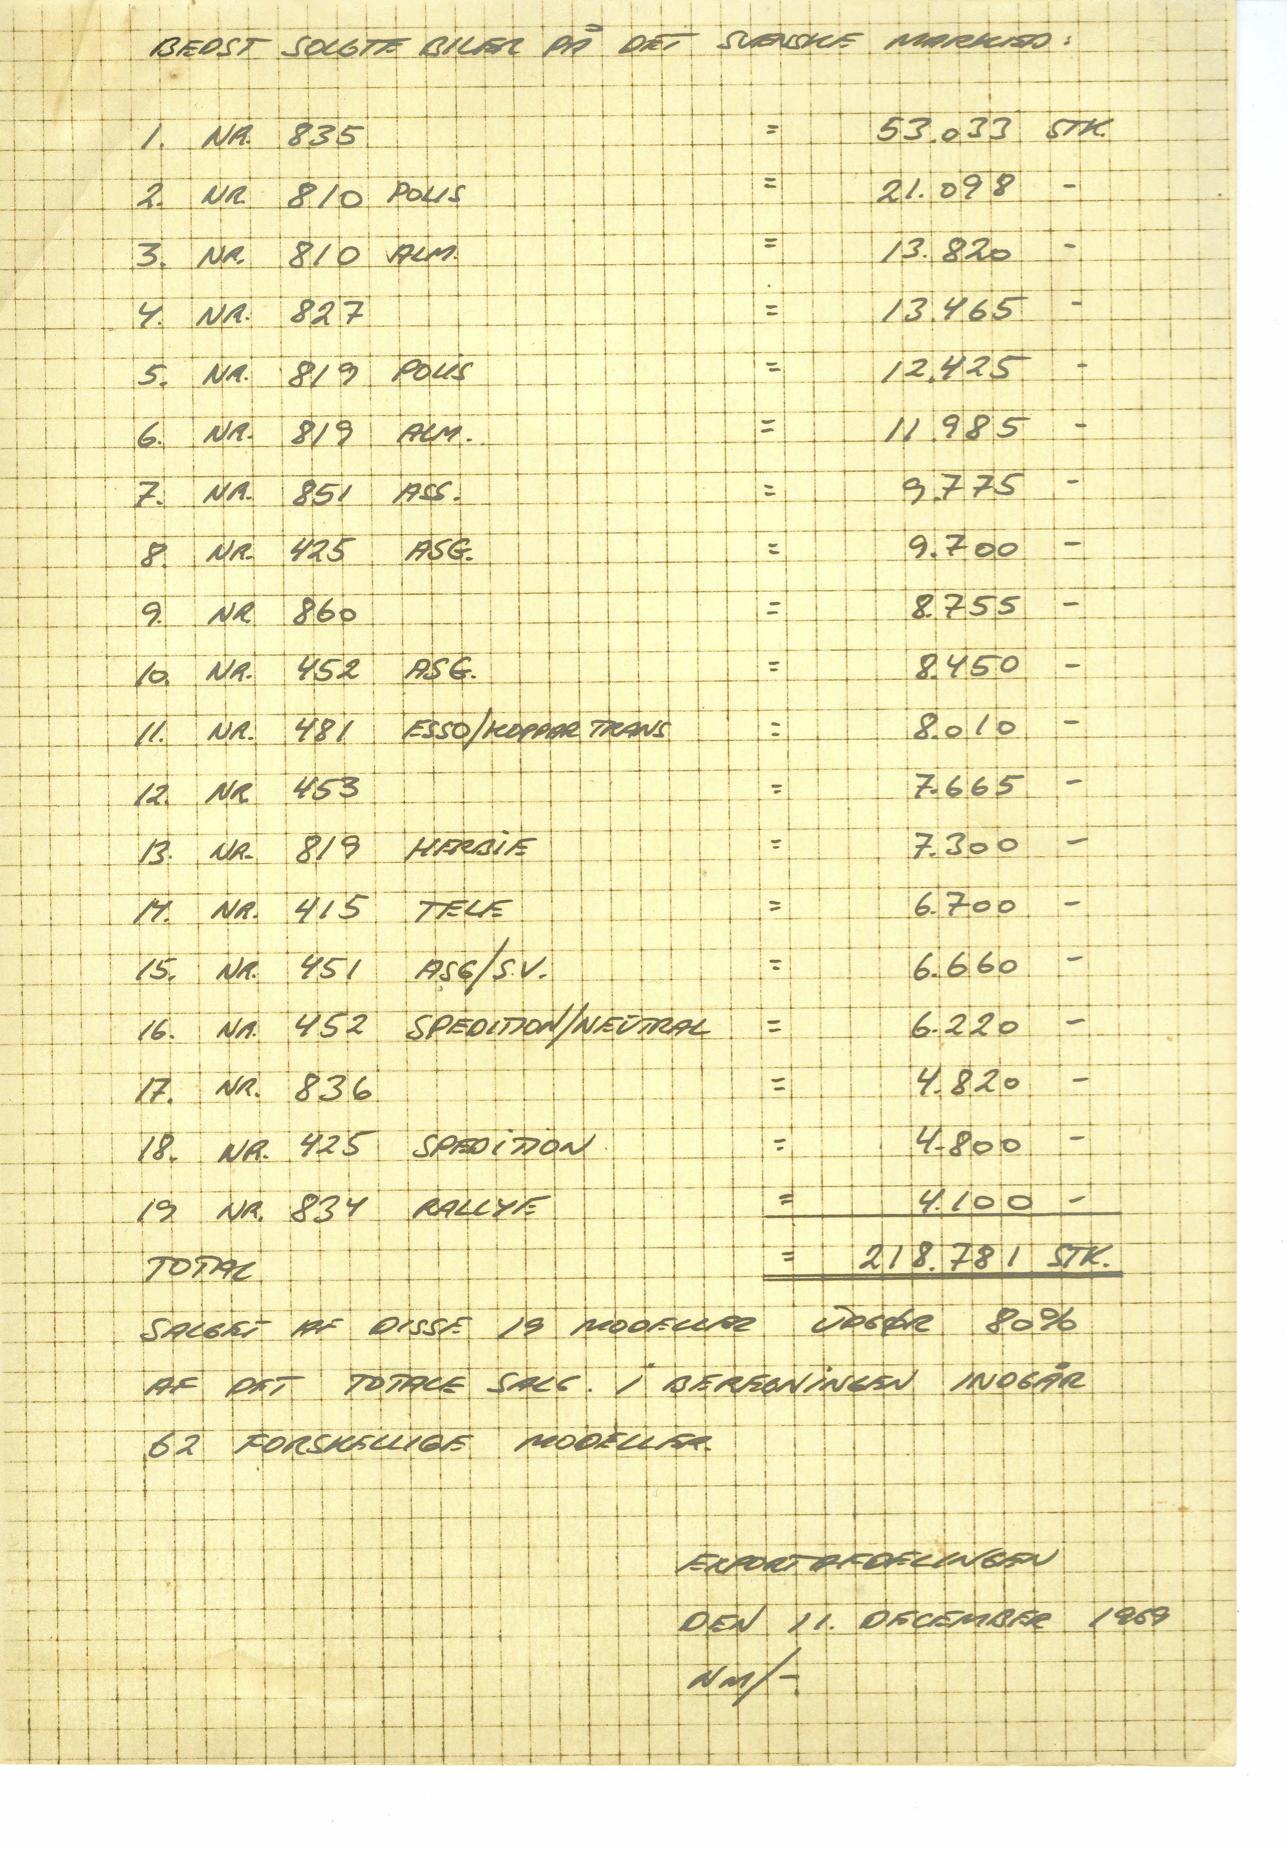 Mest solgte i 1969